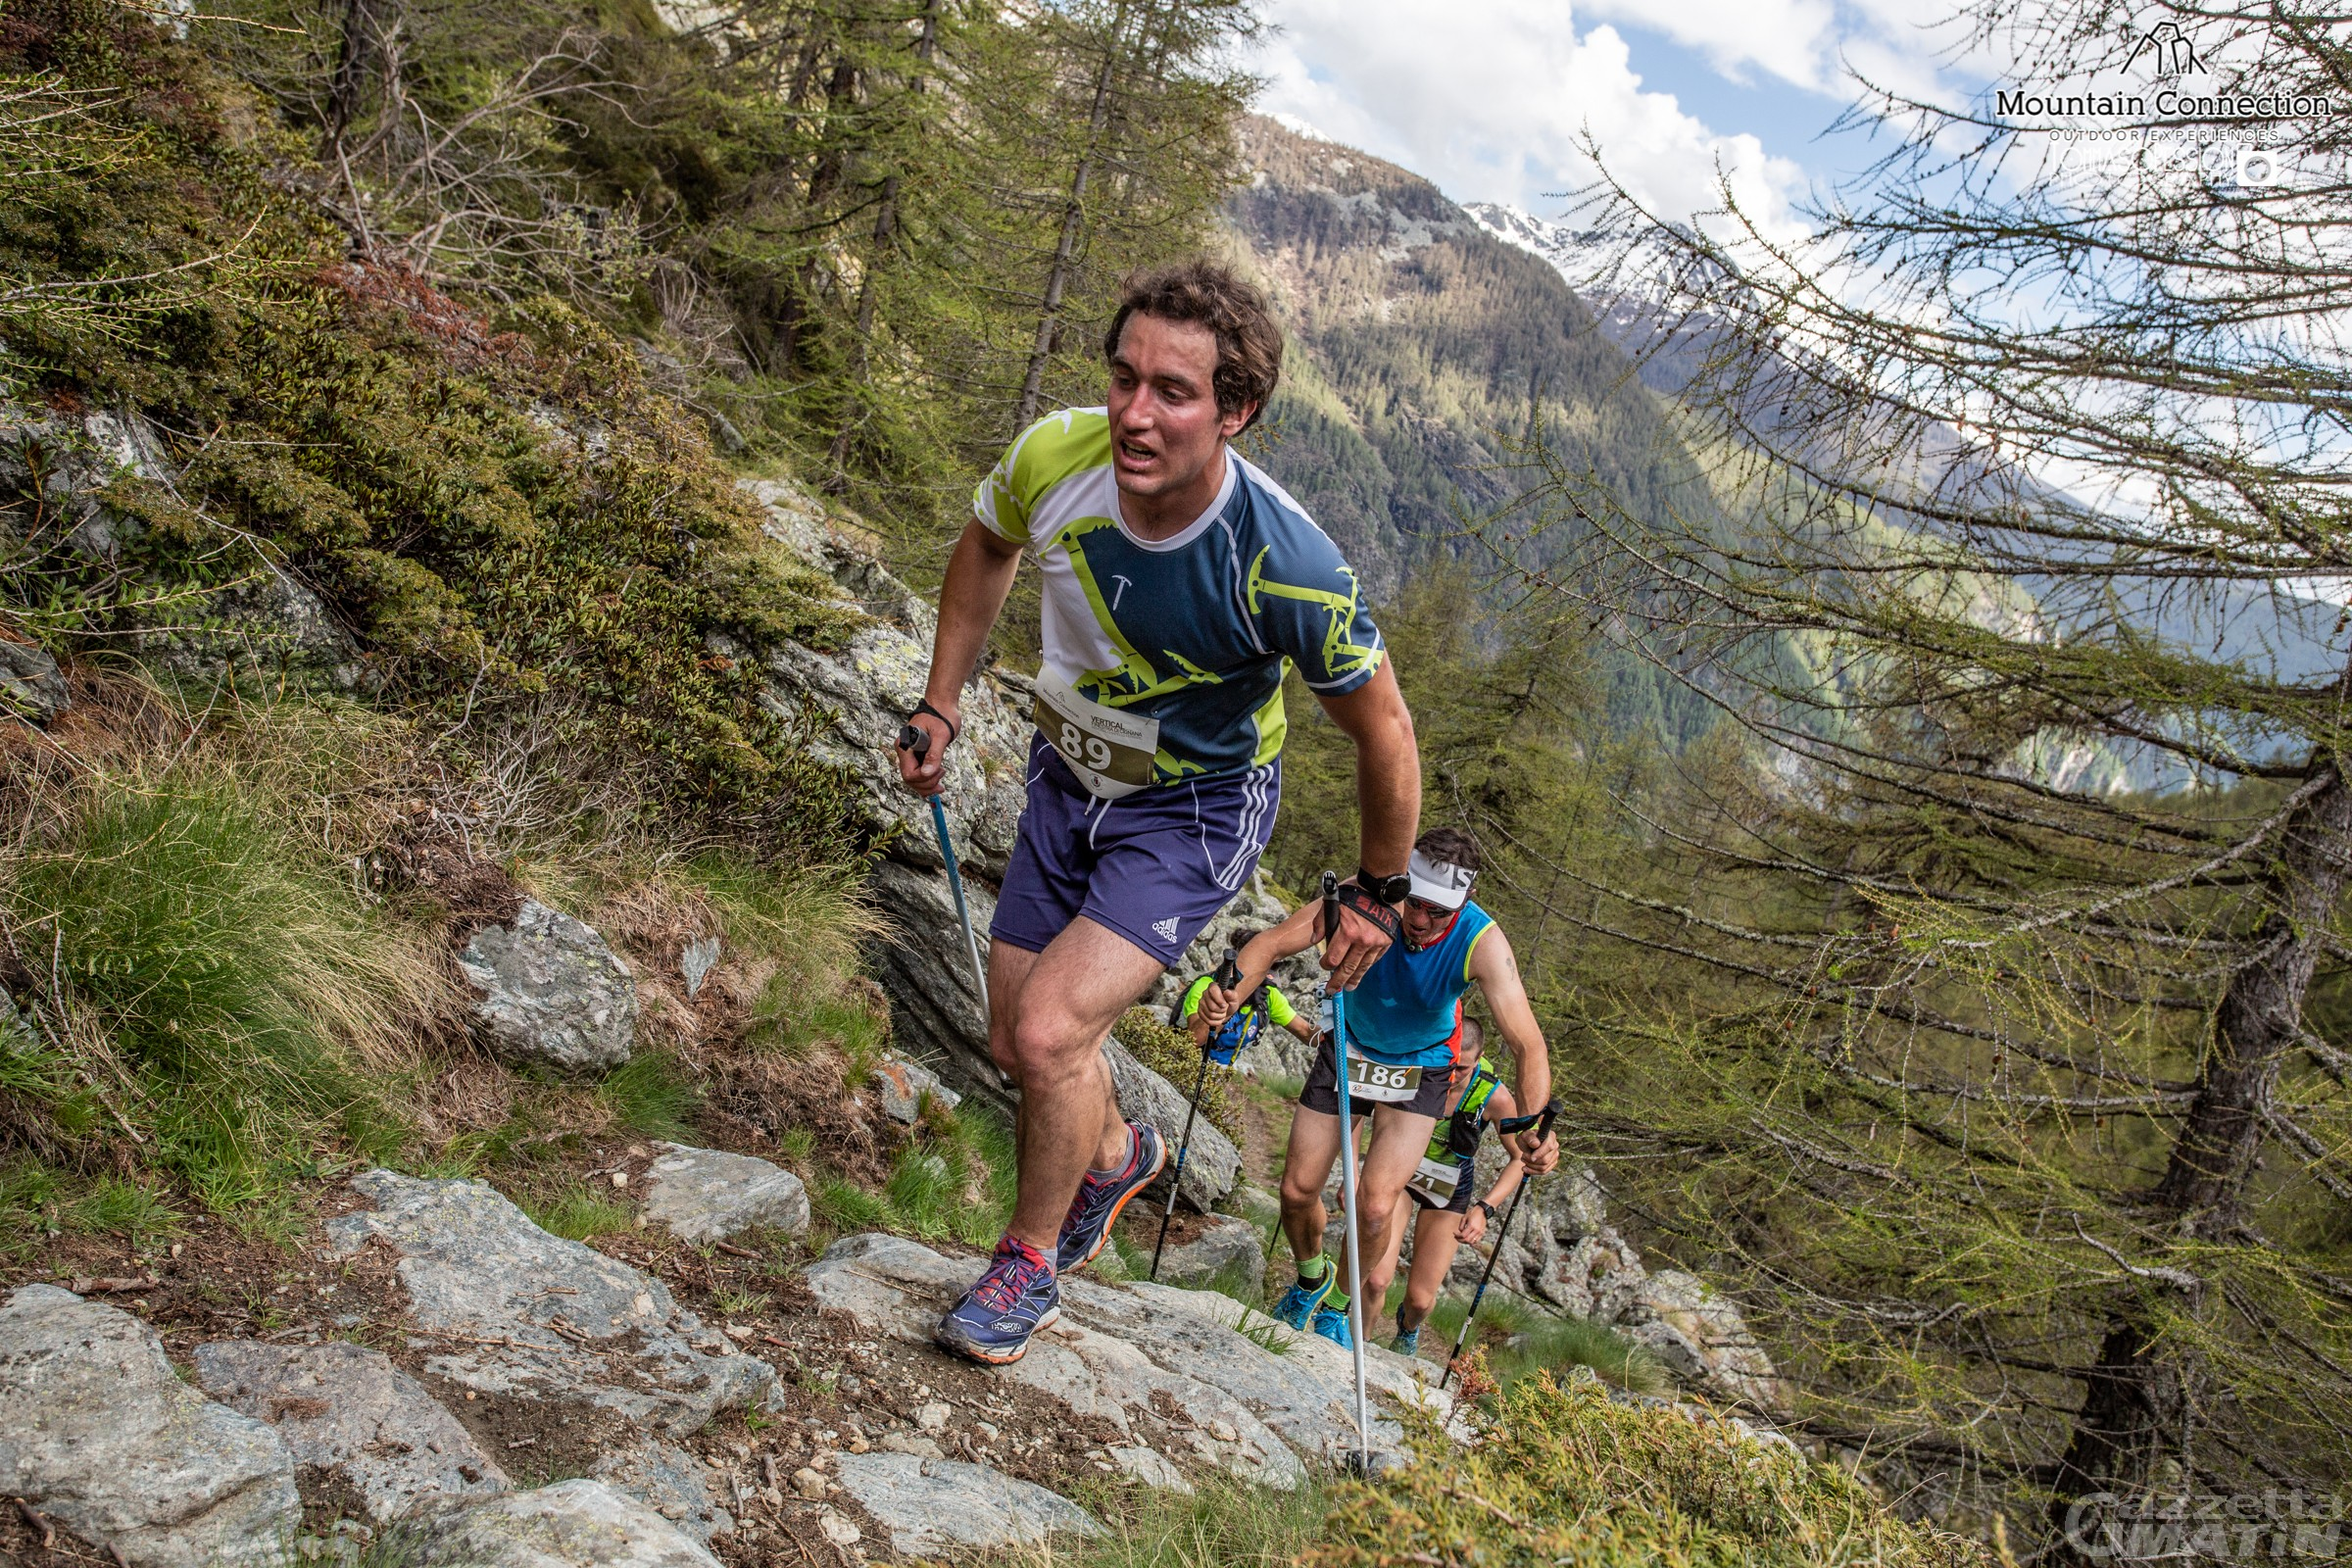 Tour Trail e Défi Vertical: dal 6 agosto si gareggia solo con Green Pass